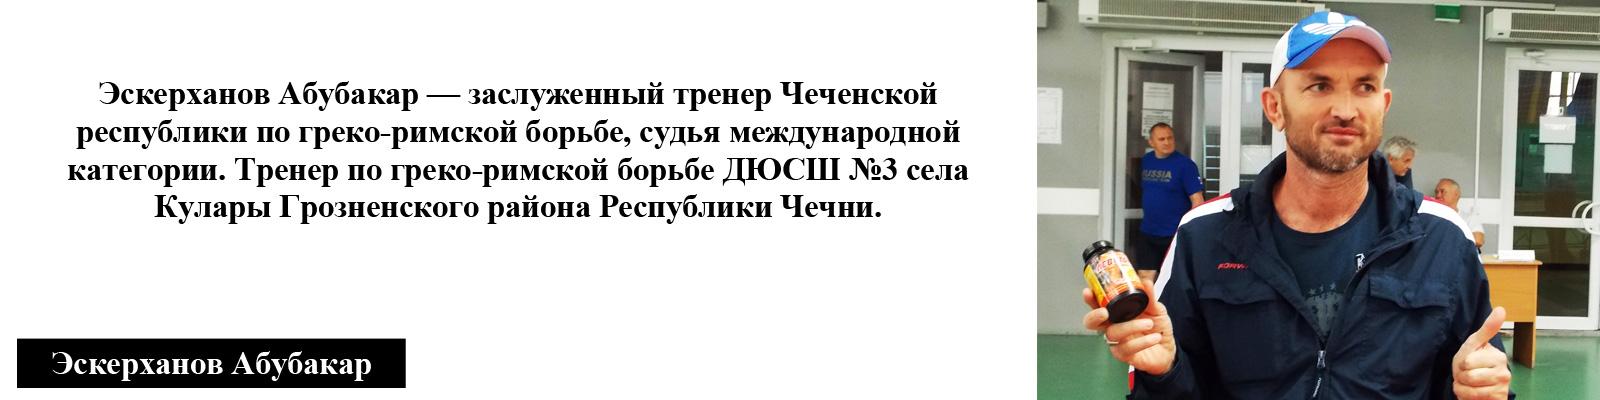 Абубакар Эскерханов борьба тренер